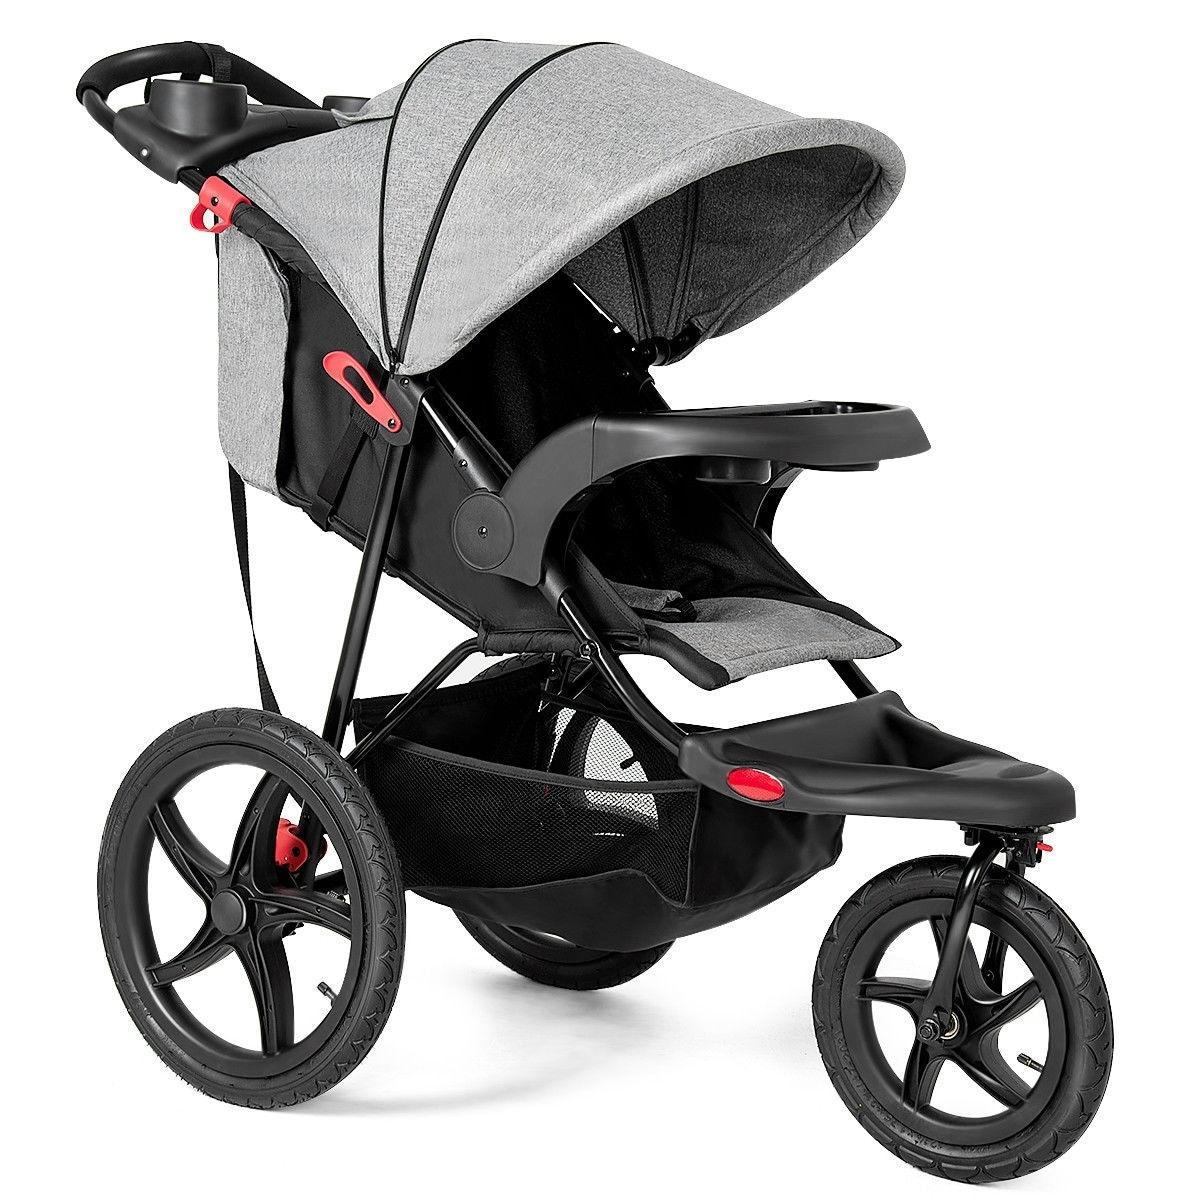 Reclining Seat with Adjustable Handlebar and Storage Basket 3-Wheel Baby Travel Stroller BABY JOY Jogger Stroller